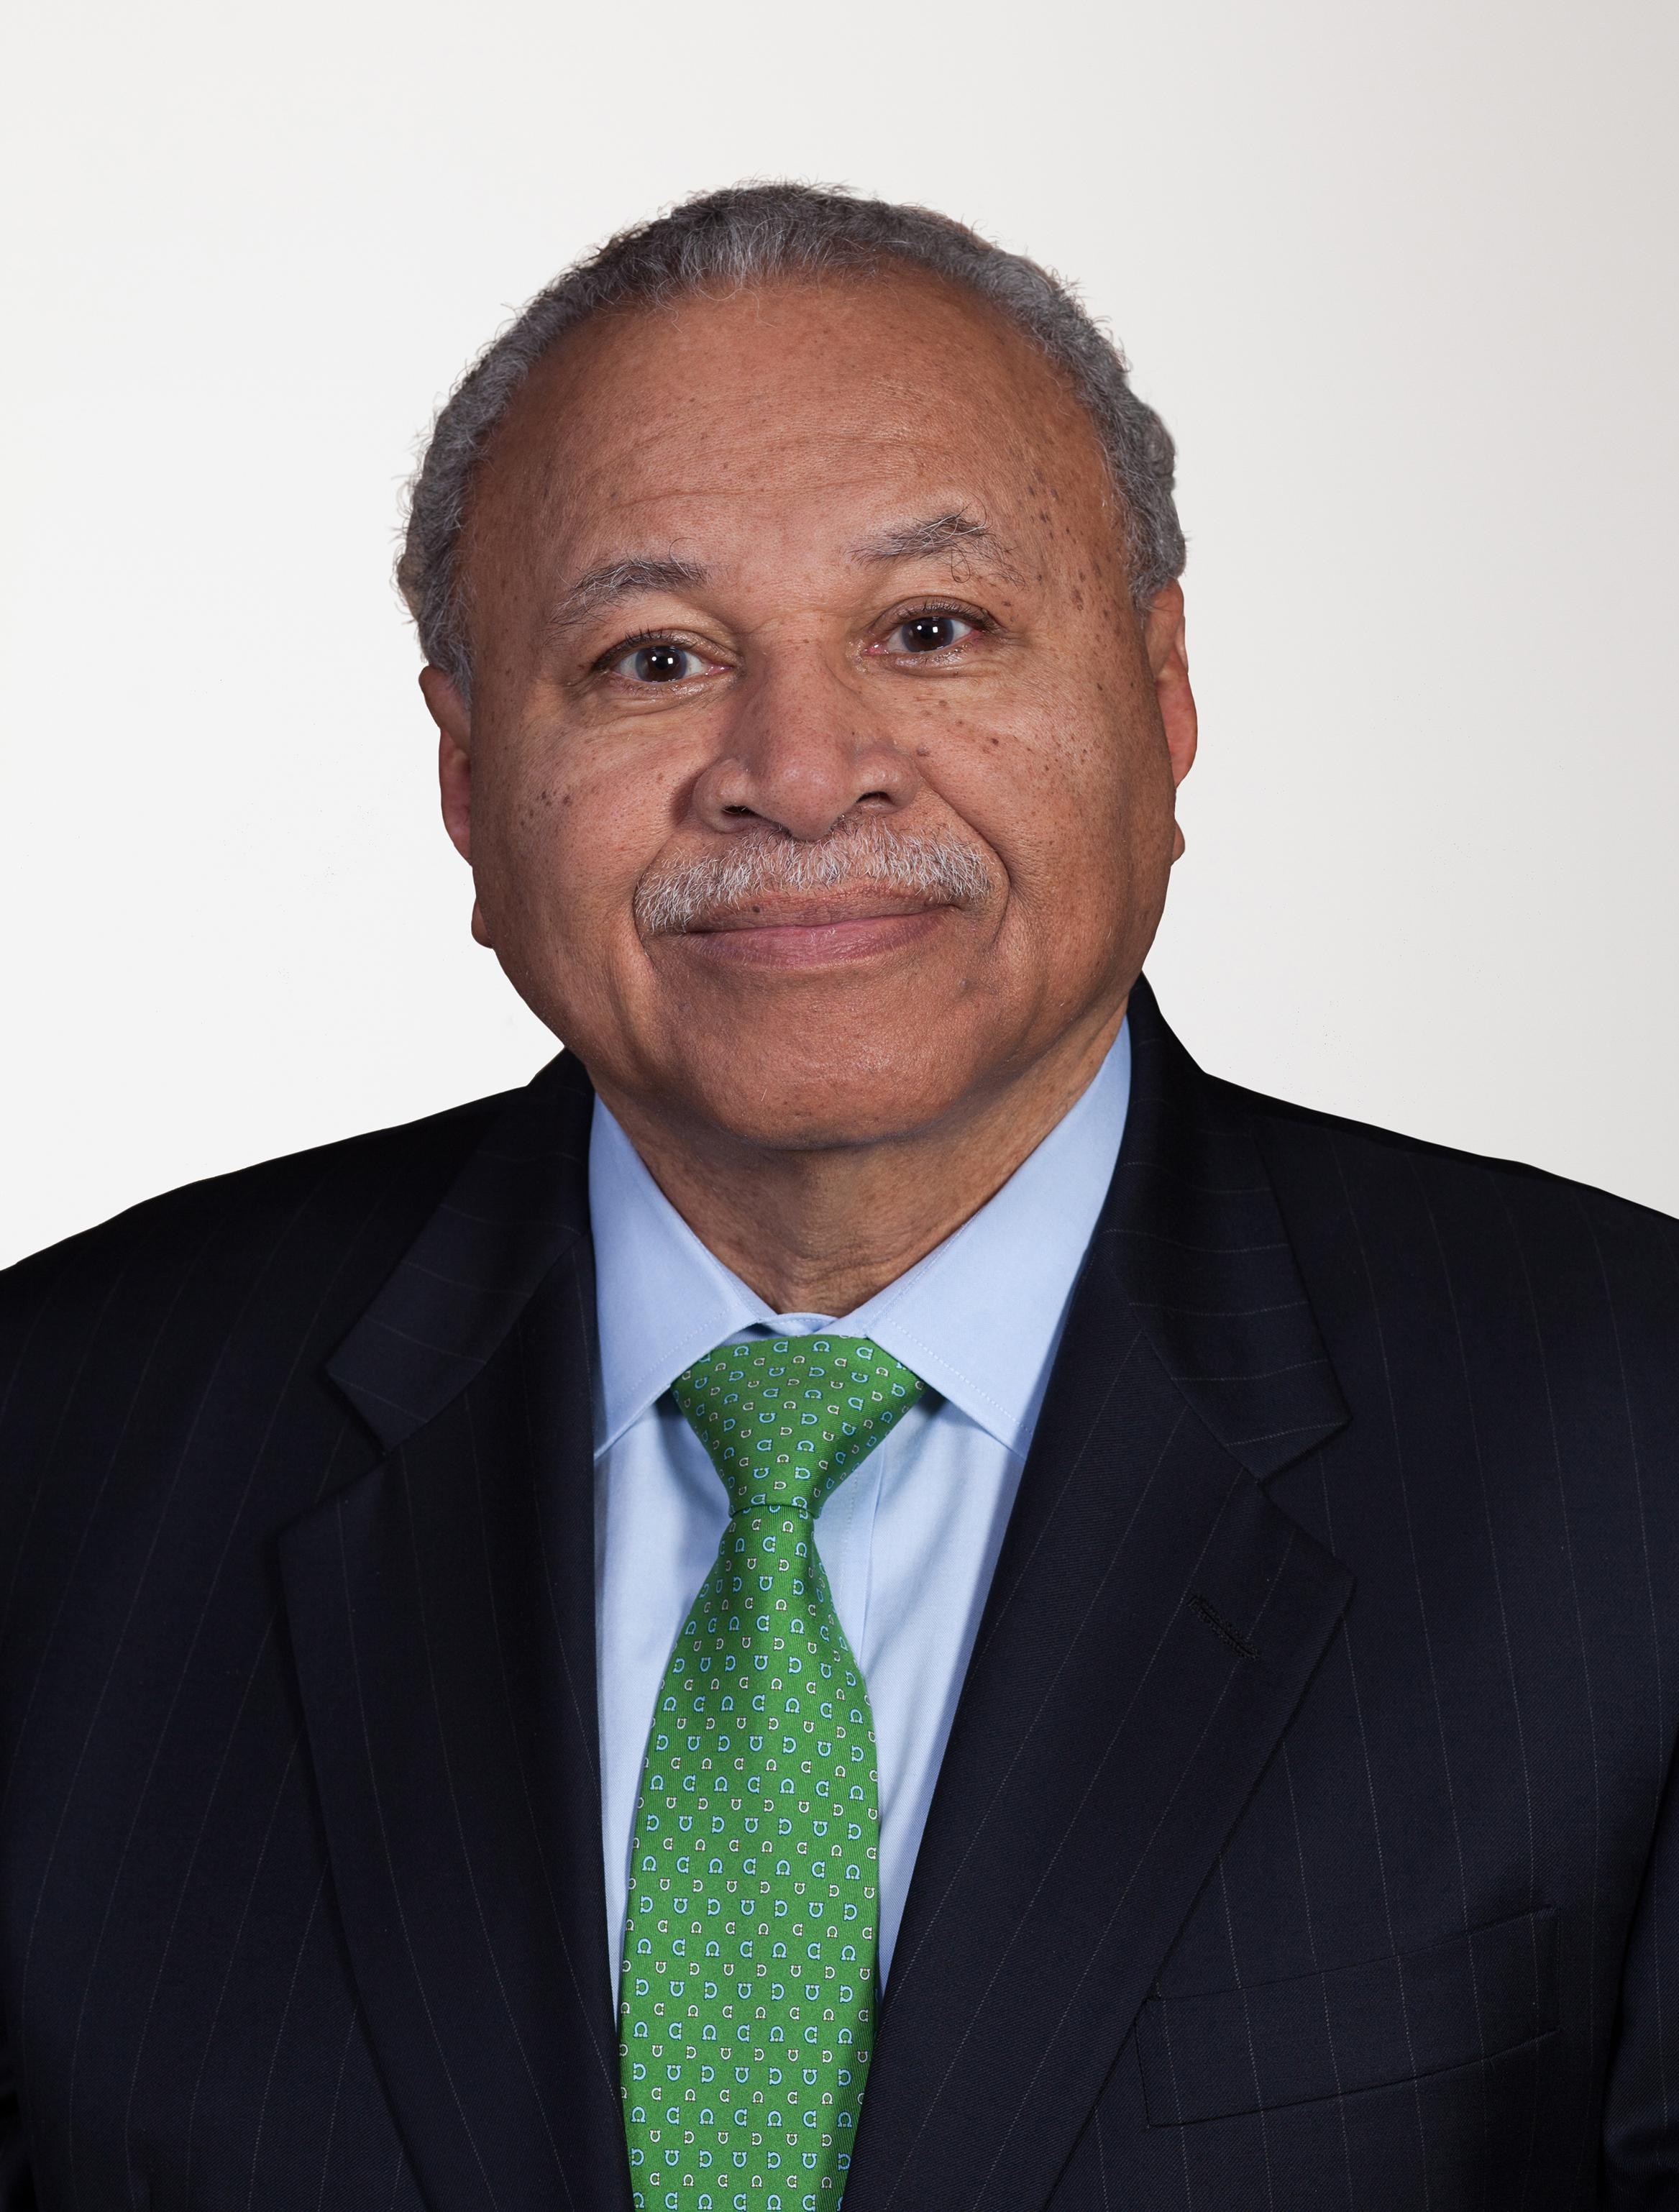 Todd C. Brown